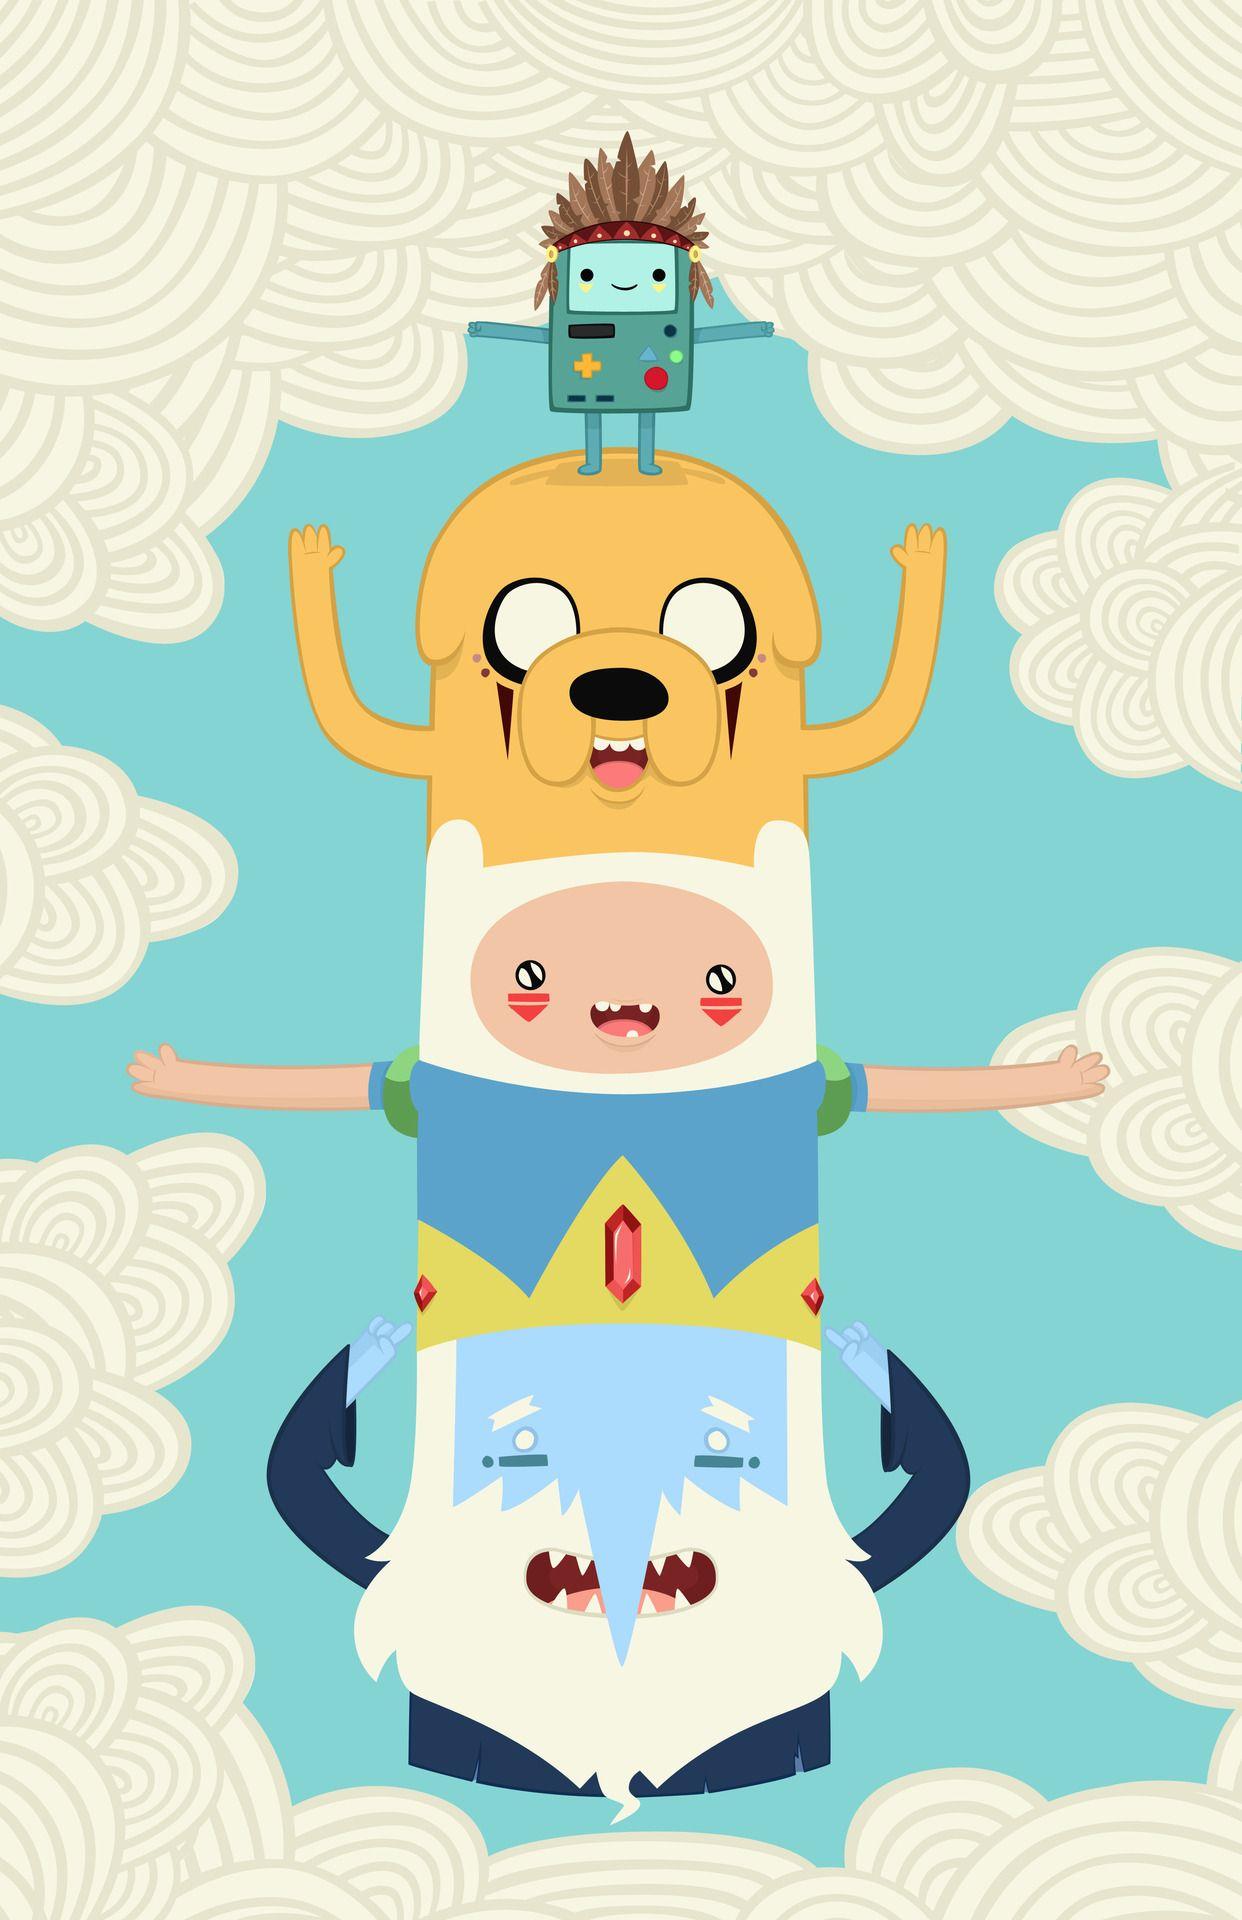 Adventure Totem Print by Daniel Mackey Alt. Art